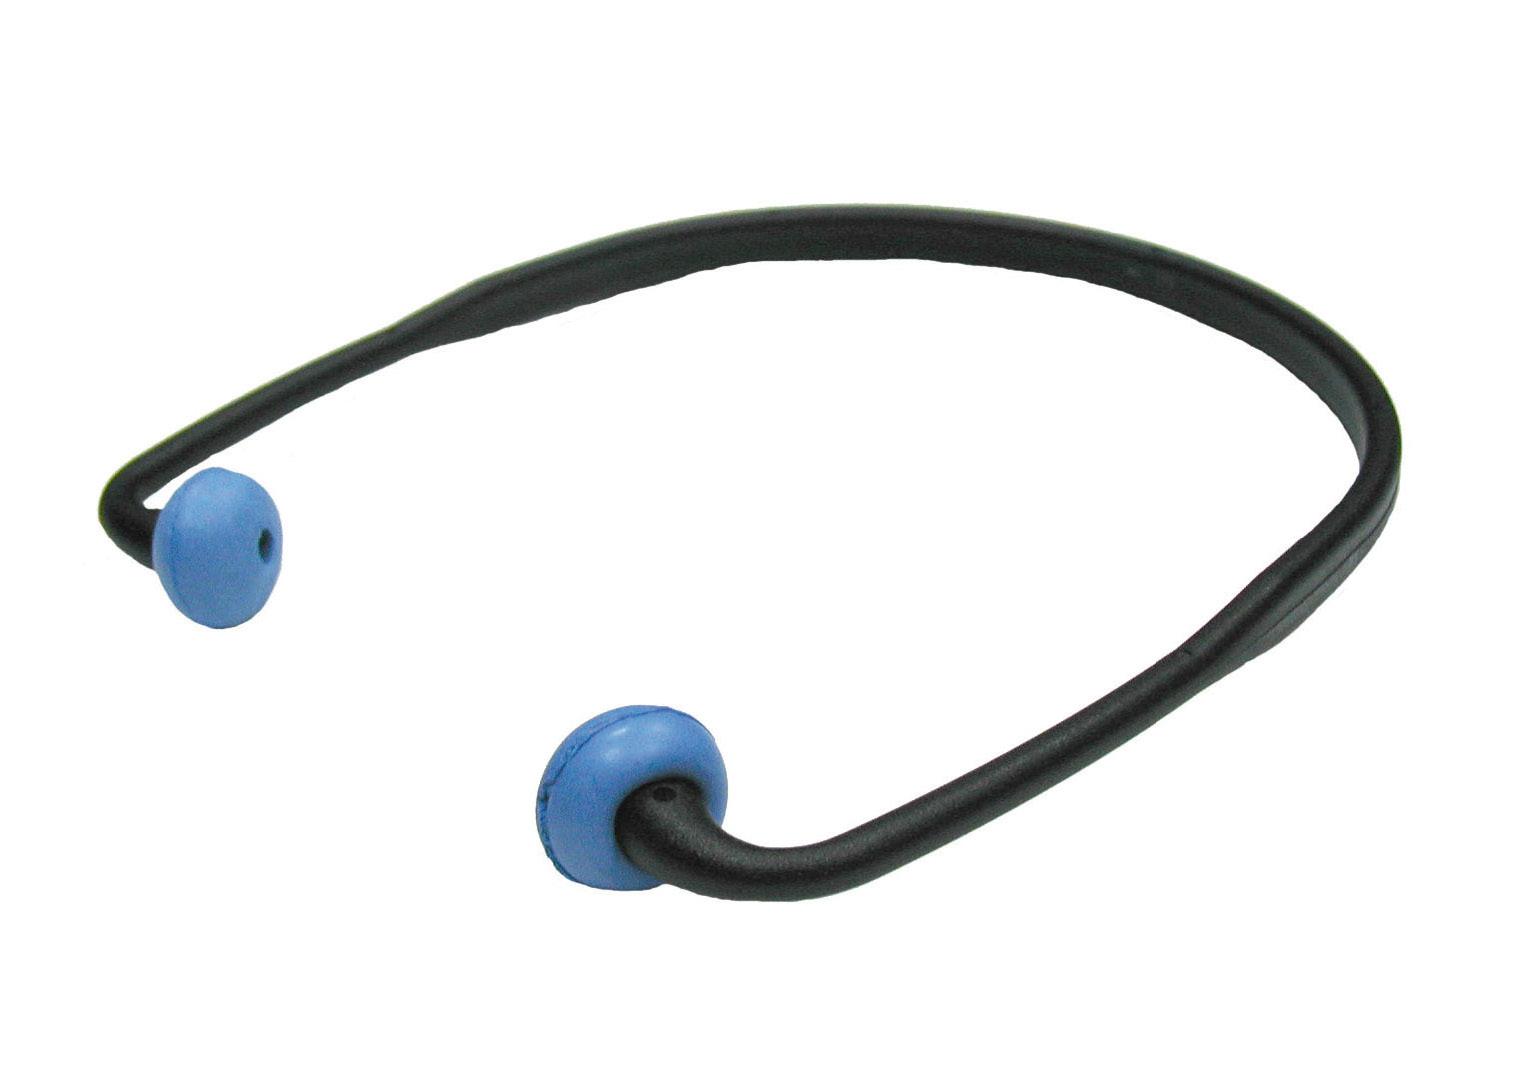 bodyguard-Ear-Plugs-Banded-Ear-Plugs-(40-per-pack)